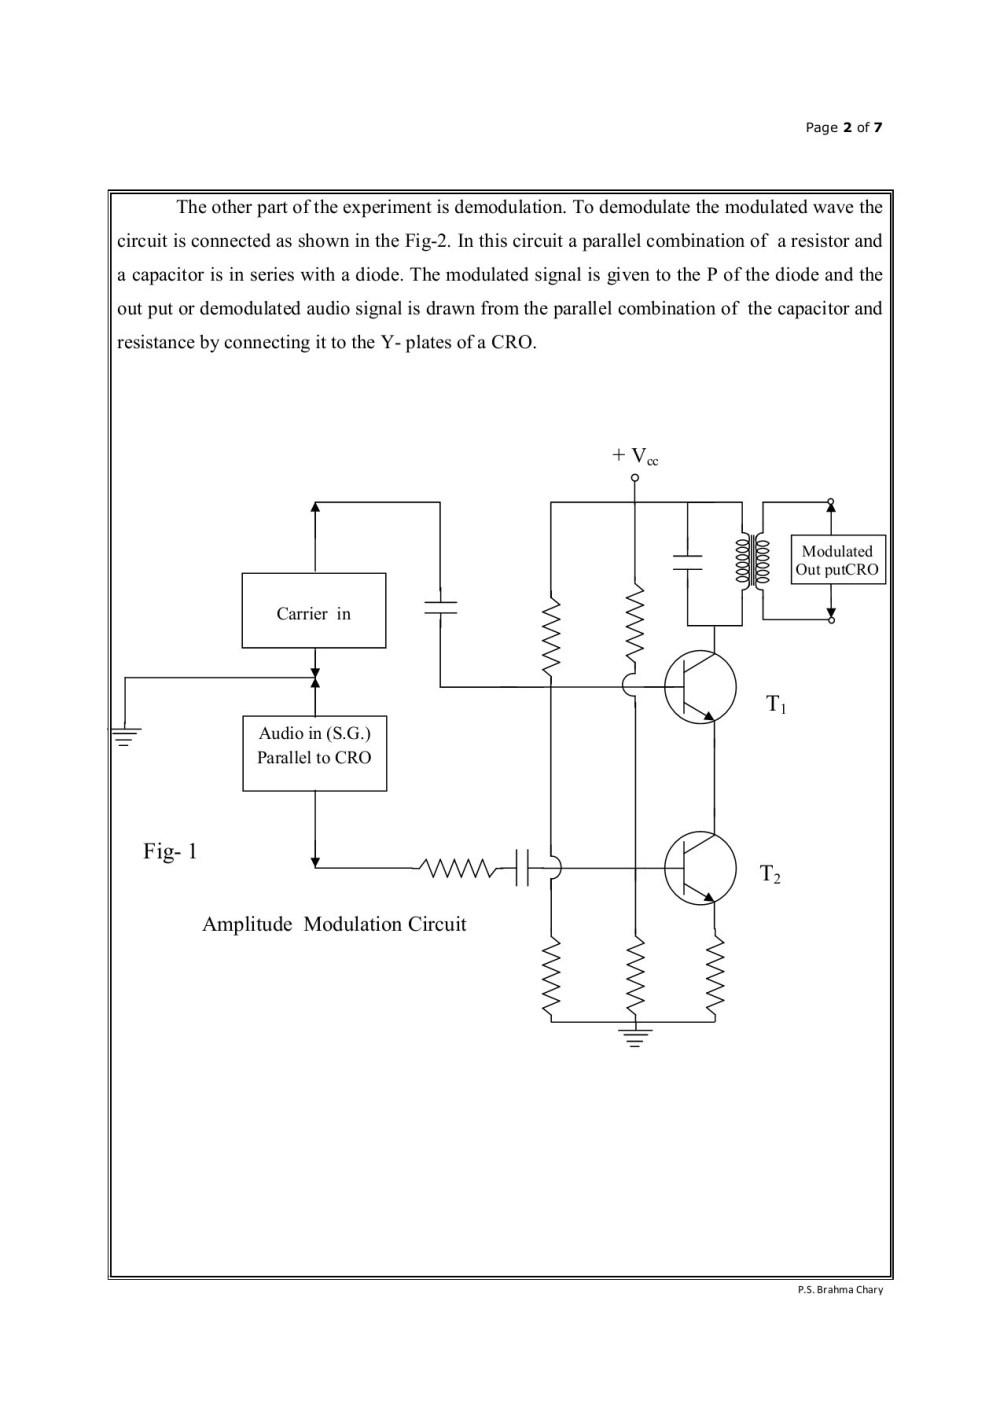 medium resolution of amplitude modulation and detection psbrahmachary s blog fliphtml5